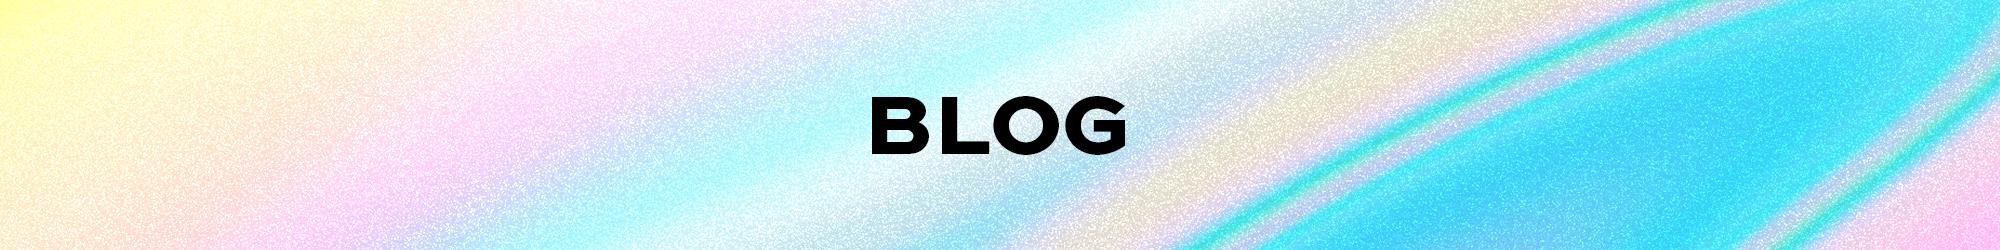 Blog Image Title